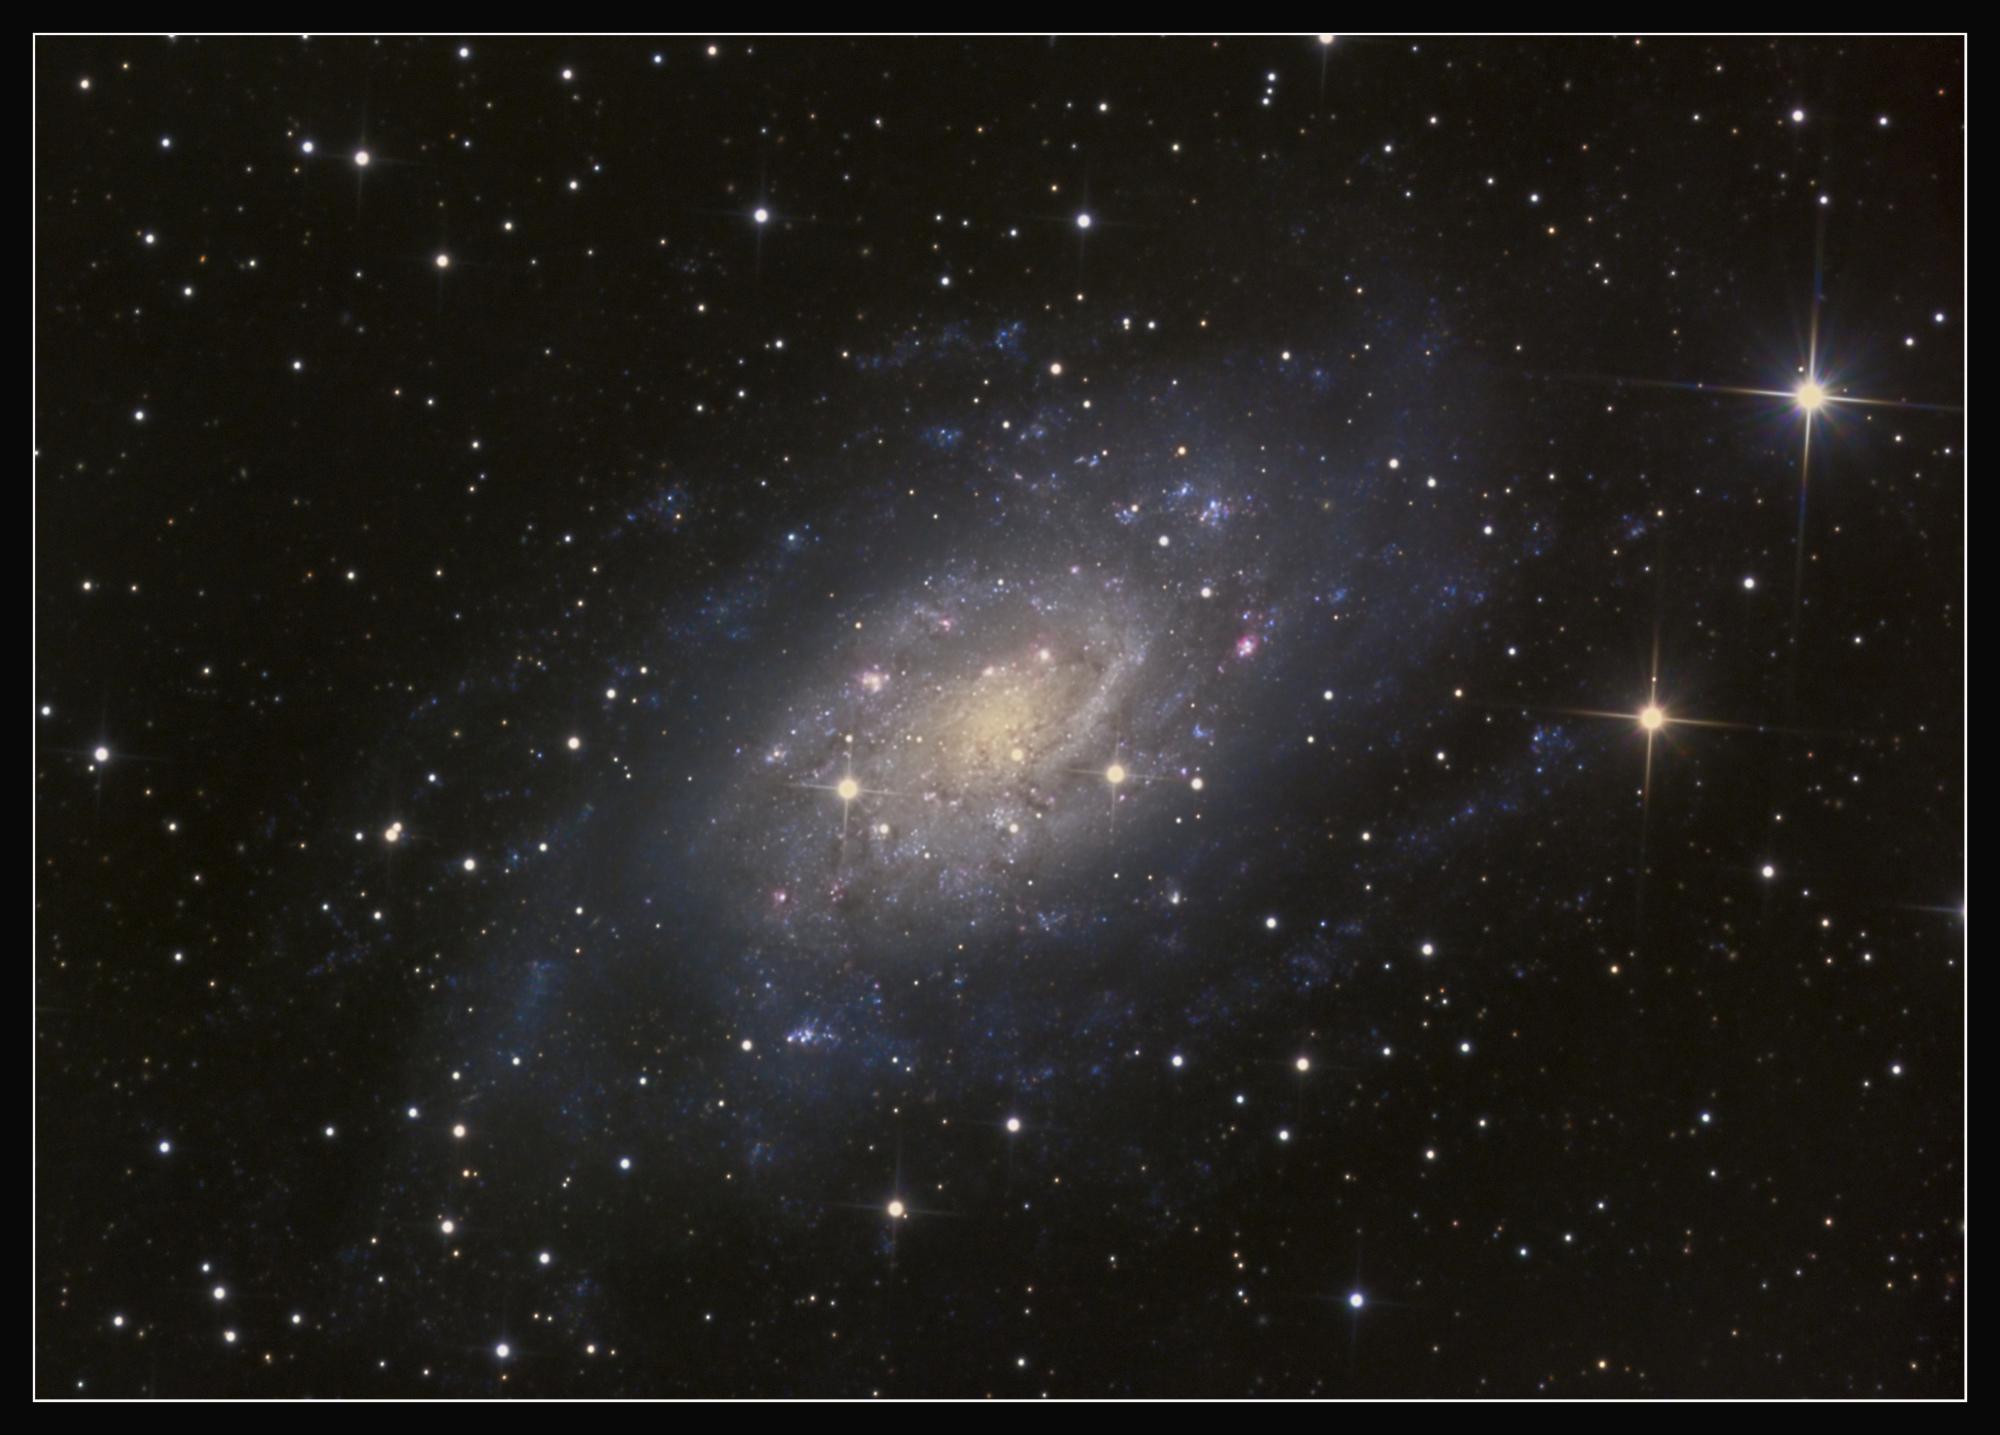 NGC_2403_LRGB_PIX_rc.thumb.jpg.b05928b28cb0a0852e8c28e5e3f7fe8c.jpg